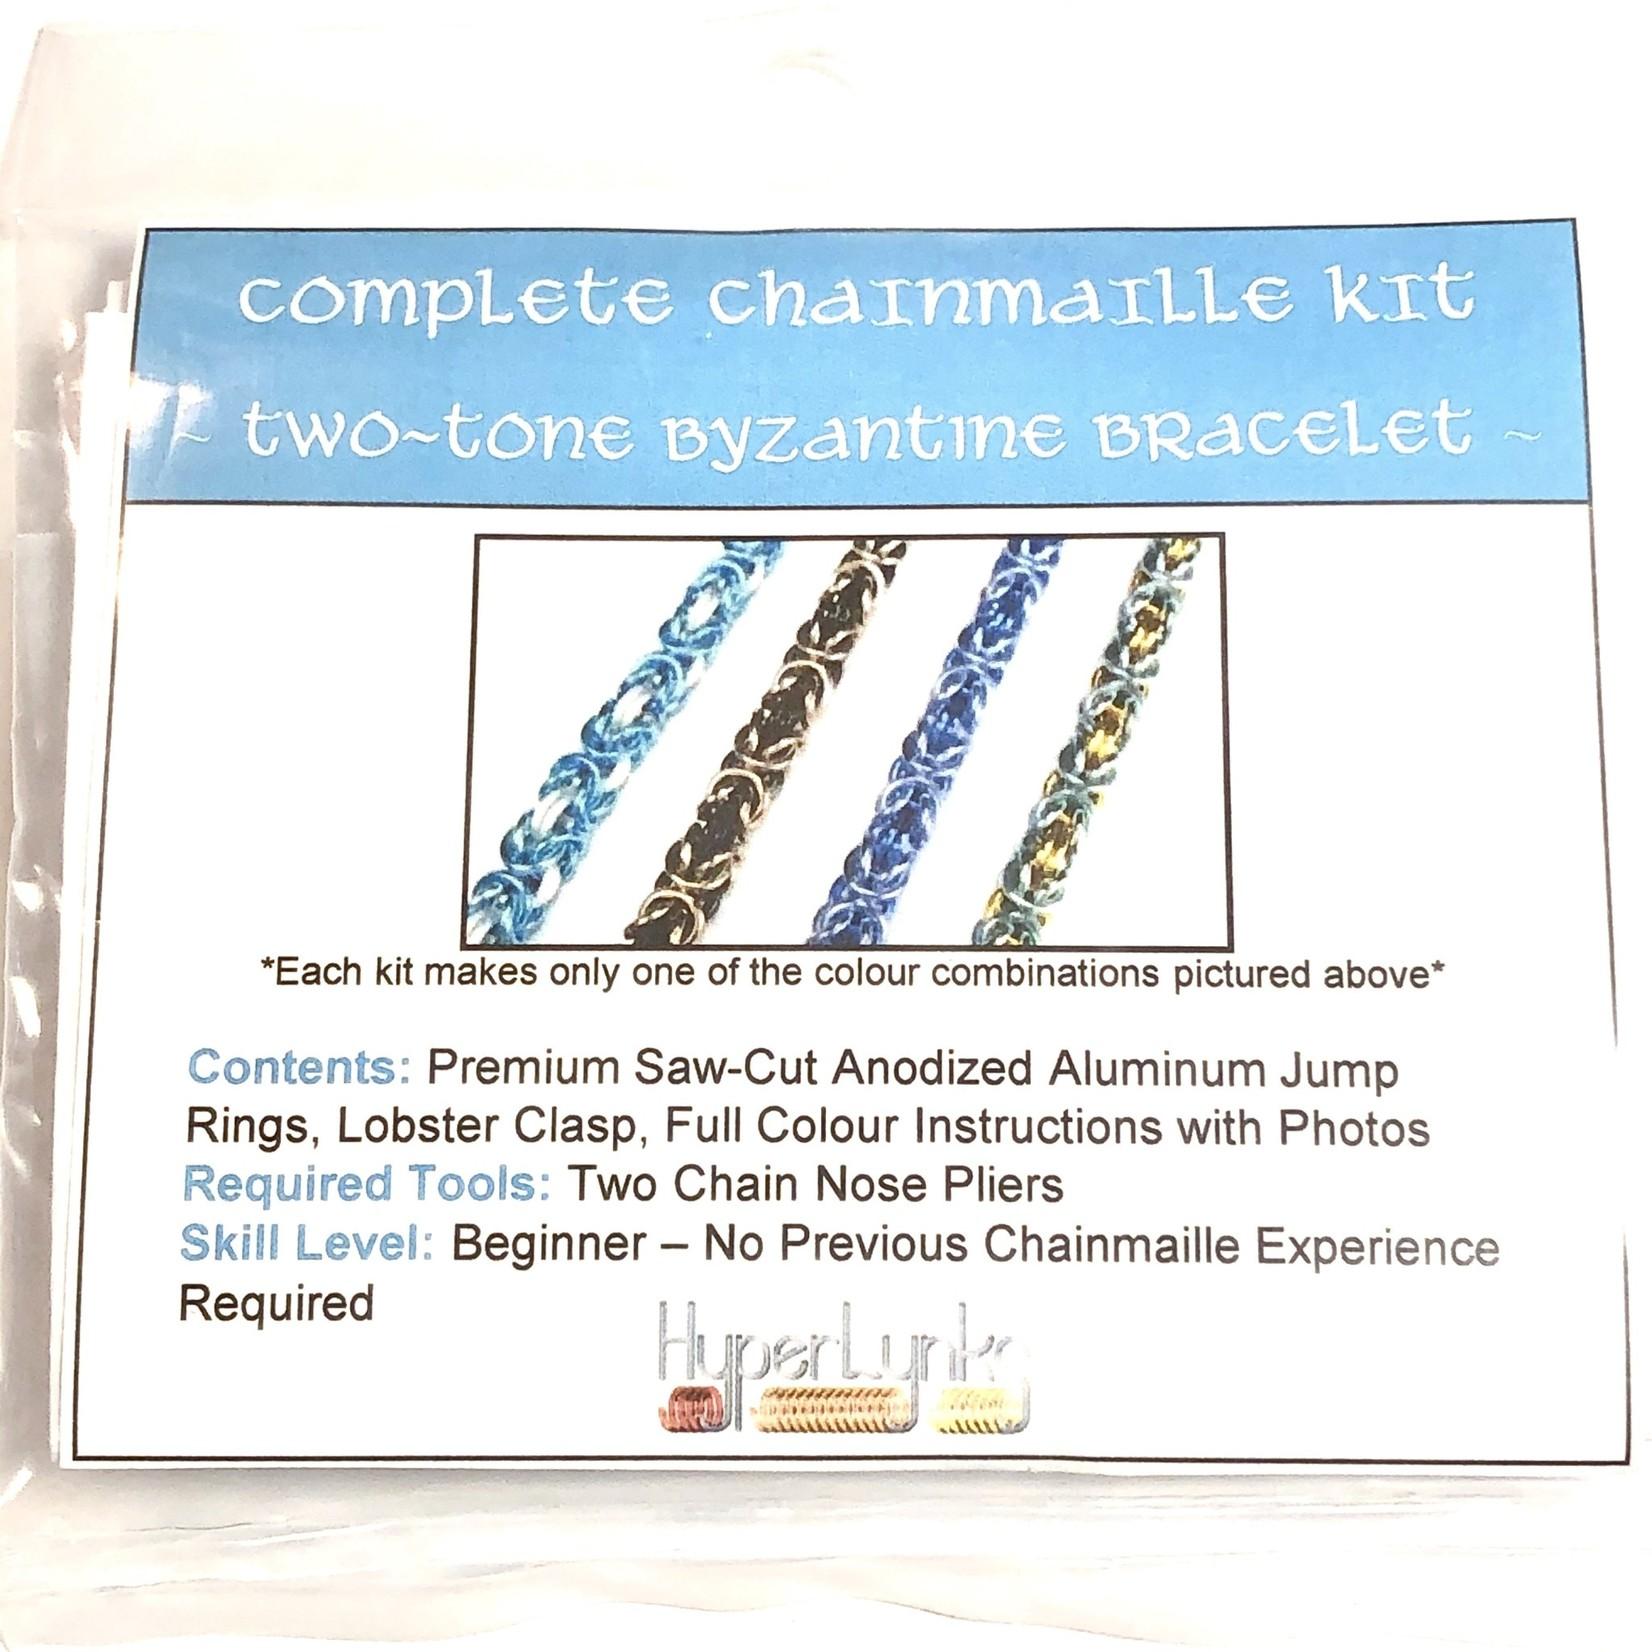 Chain Maille Two-Tone Byzantine Bracelet Kit Sky Blue & White